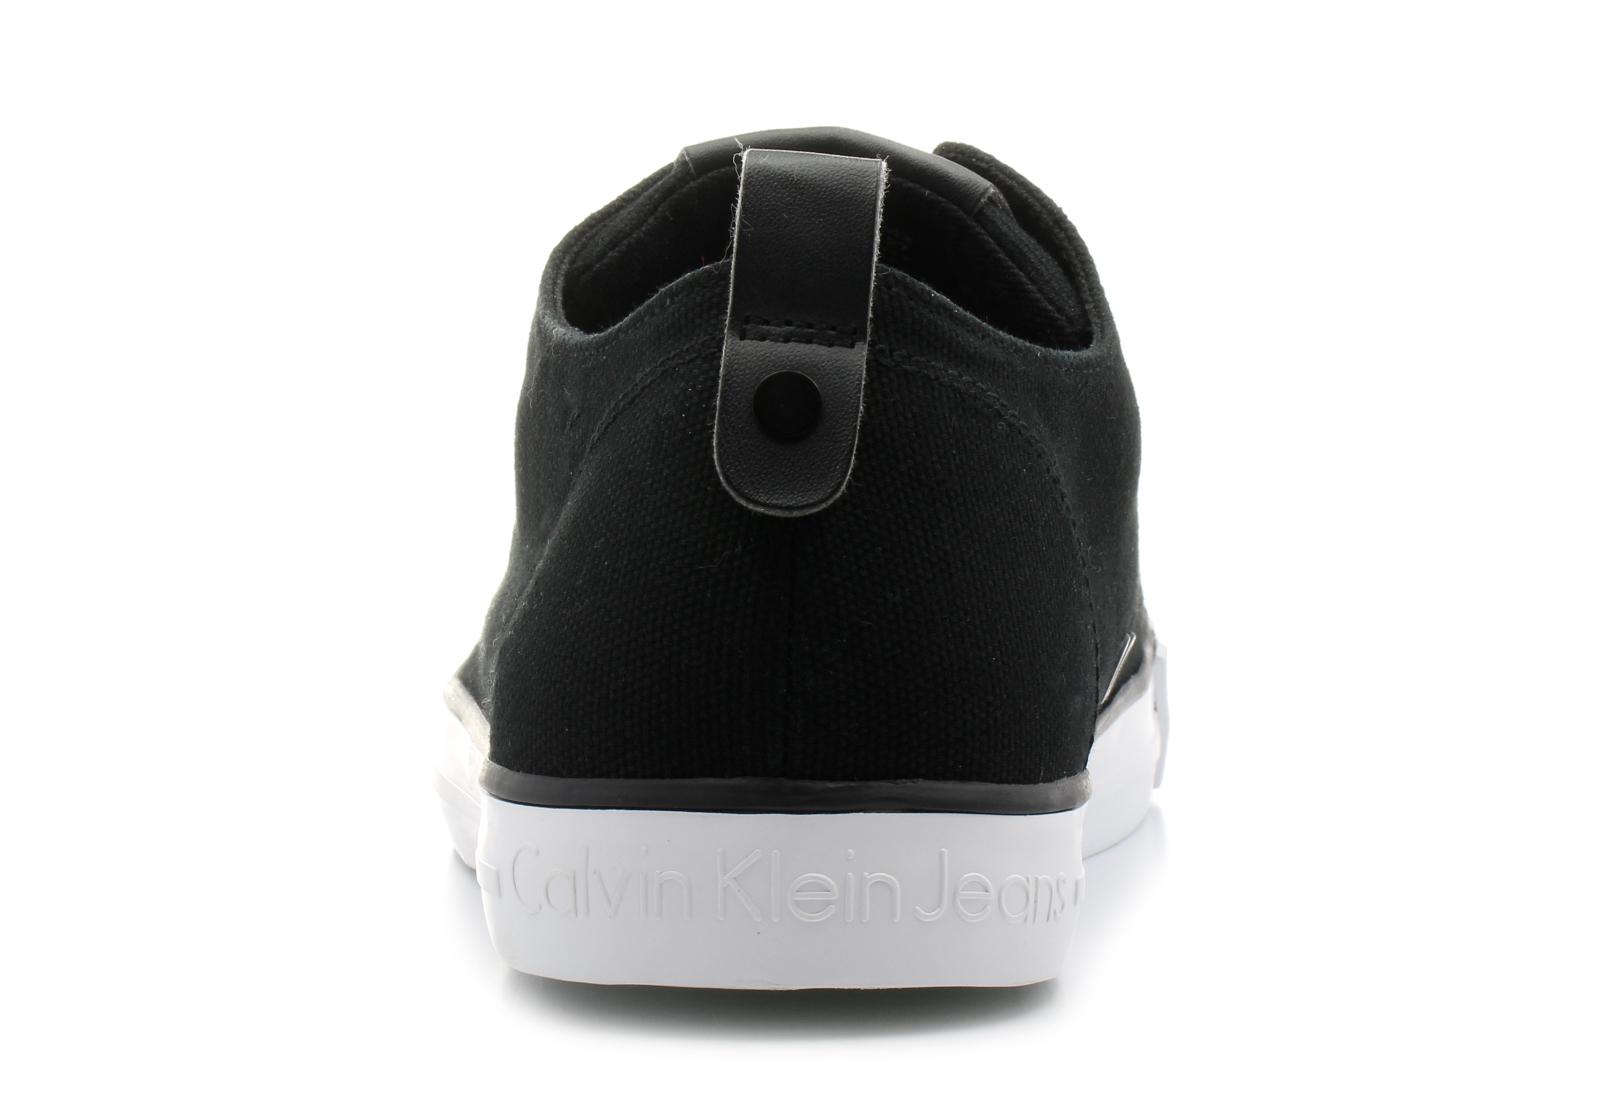 a507166b9 Calvin Klein Jeans Shoes - Arnold - S0369-BLK - Online shop for ...